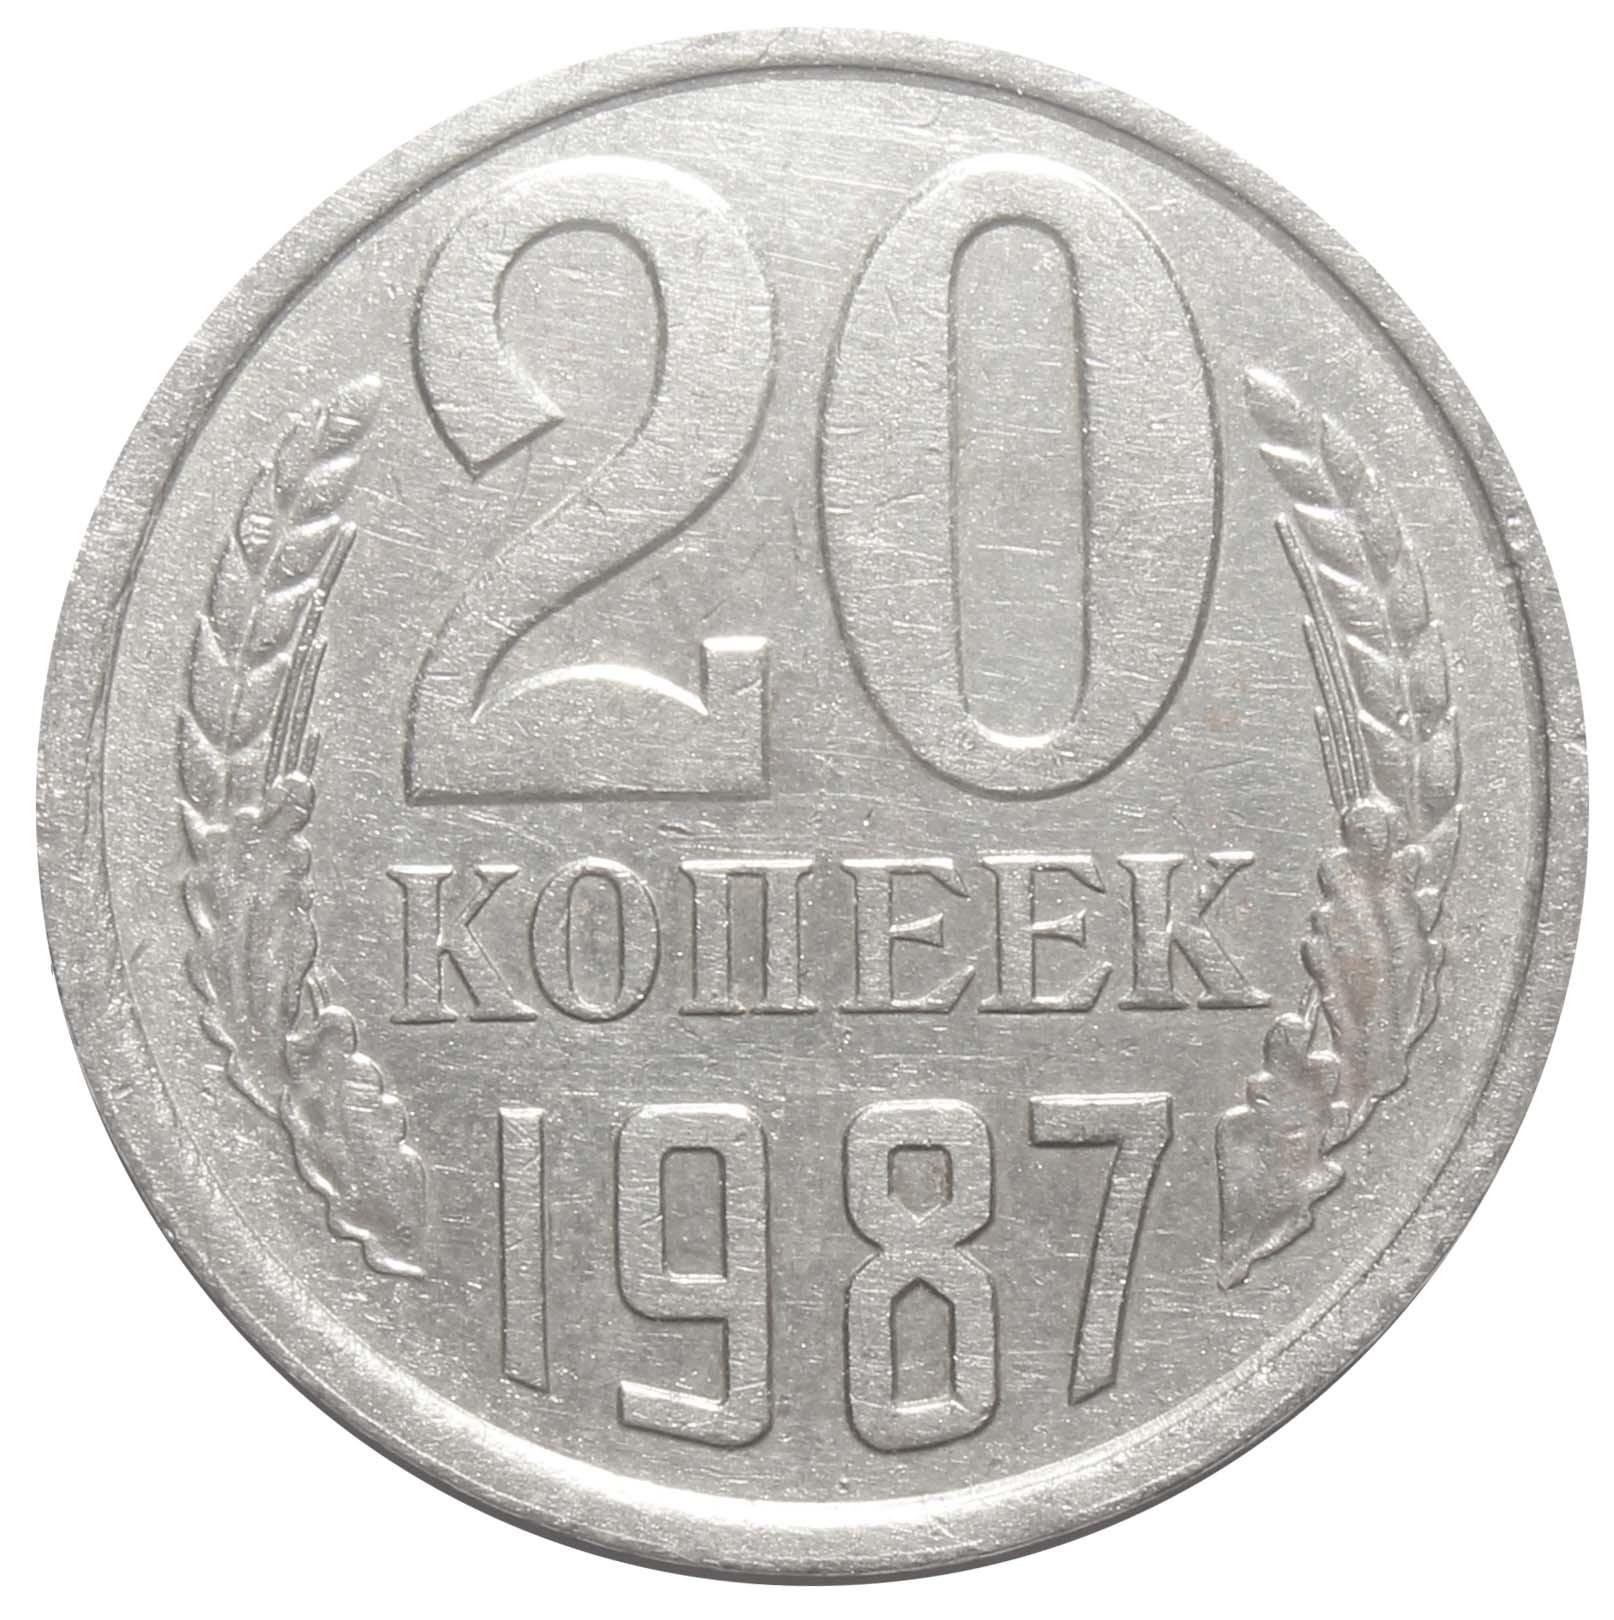 20 копеек 1987 года. XF-